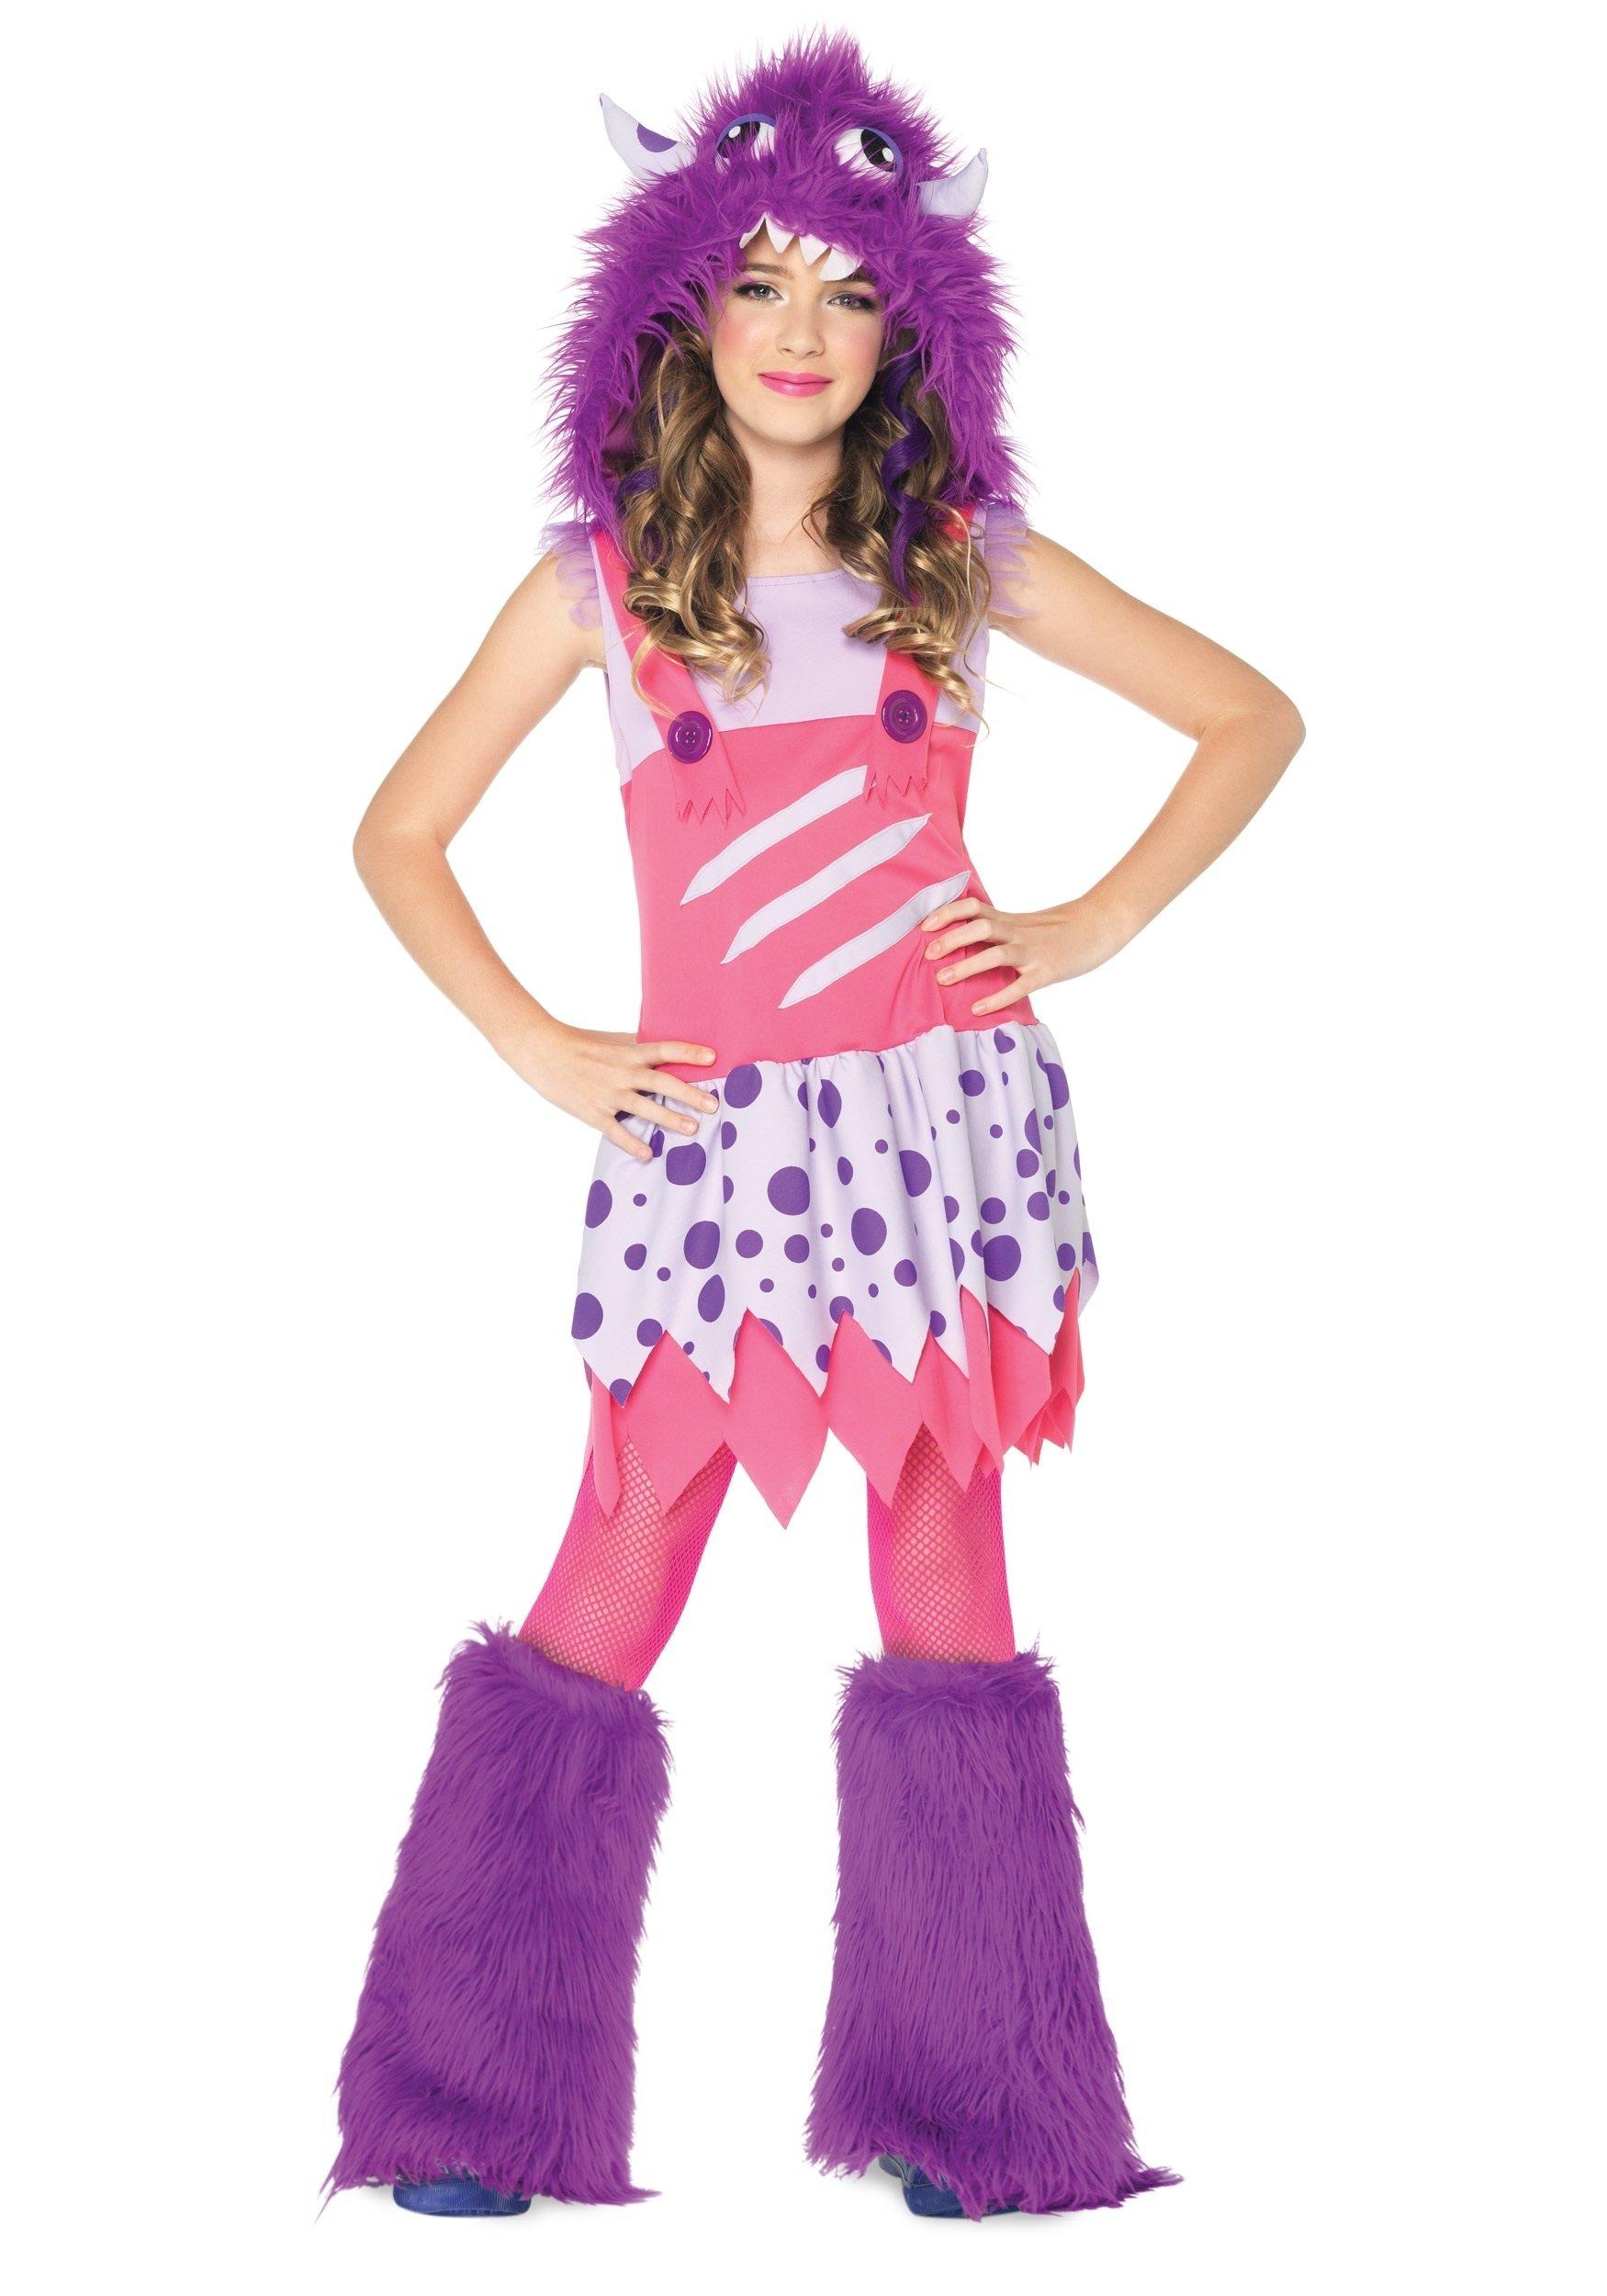 10 Unique Cute Halloween Costume Ideas For Girls girls furball monster costume halloween costume ideas 2016 3